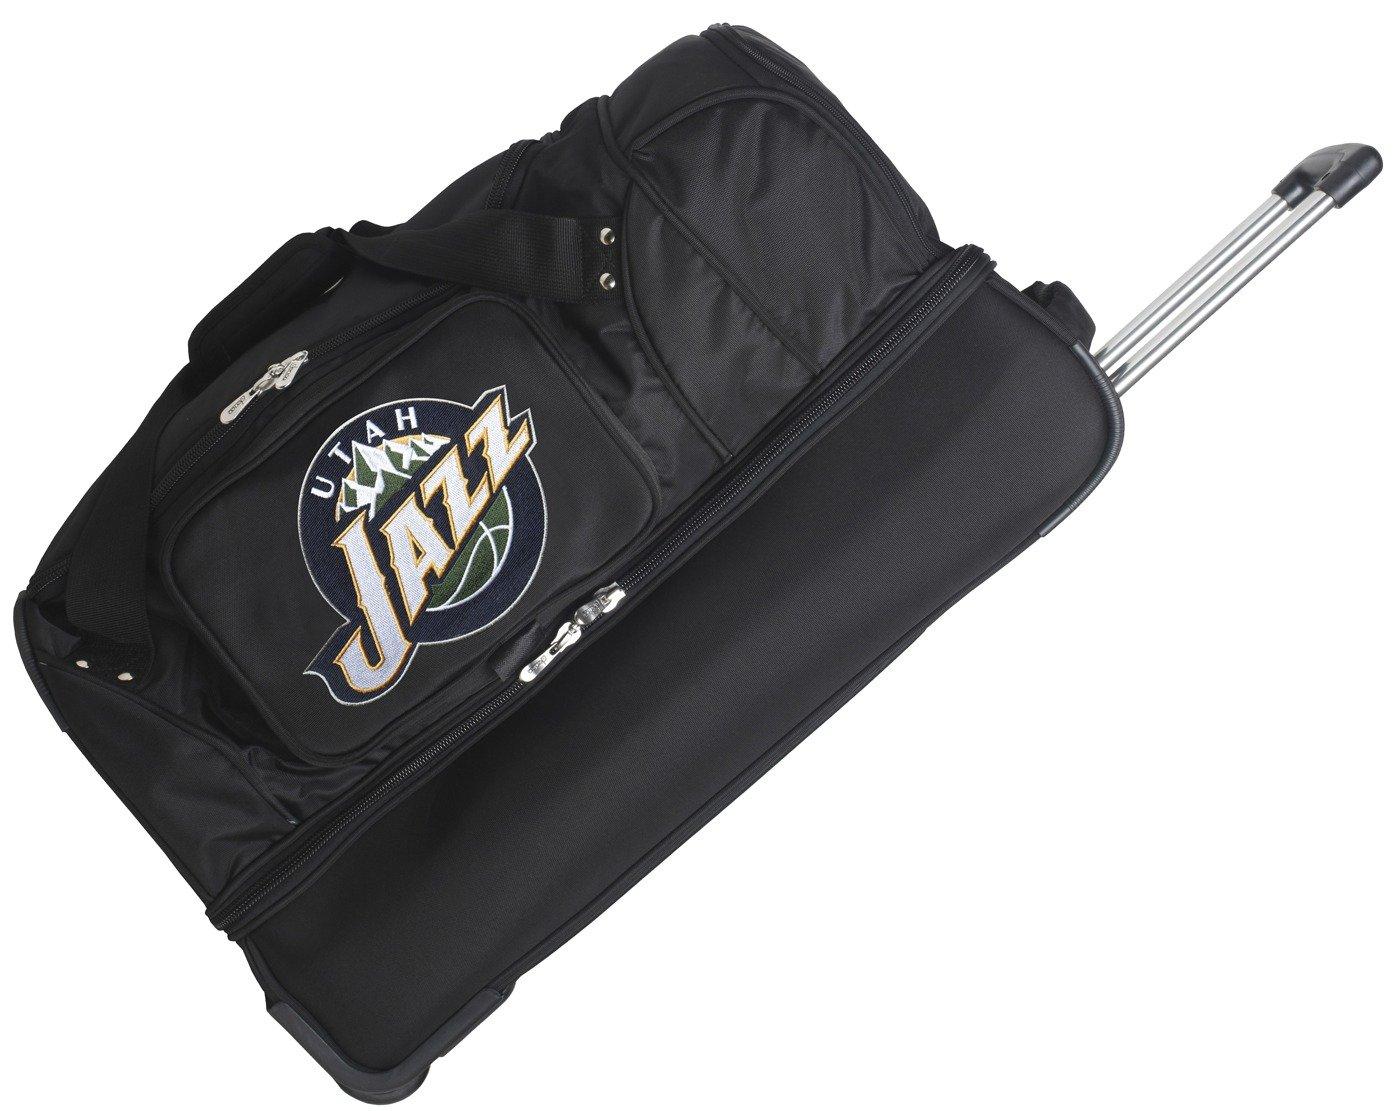 NBA 27'' 2-Wheeled Travel Duffel NBA Team: Utah Jazz by Denco Sports Luggage